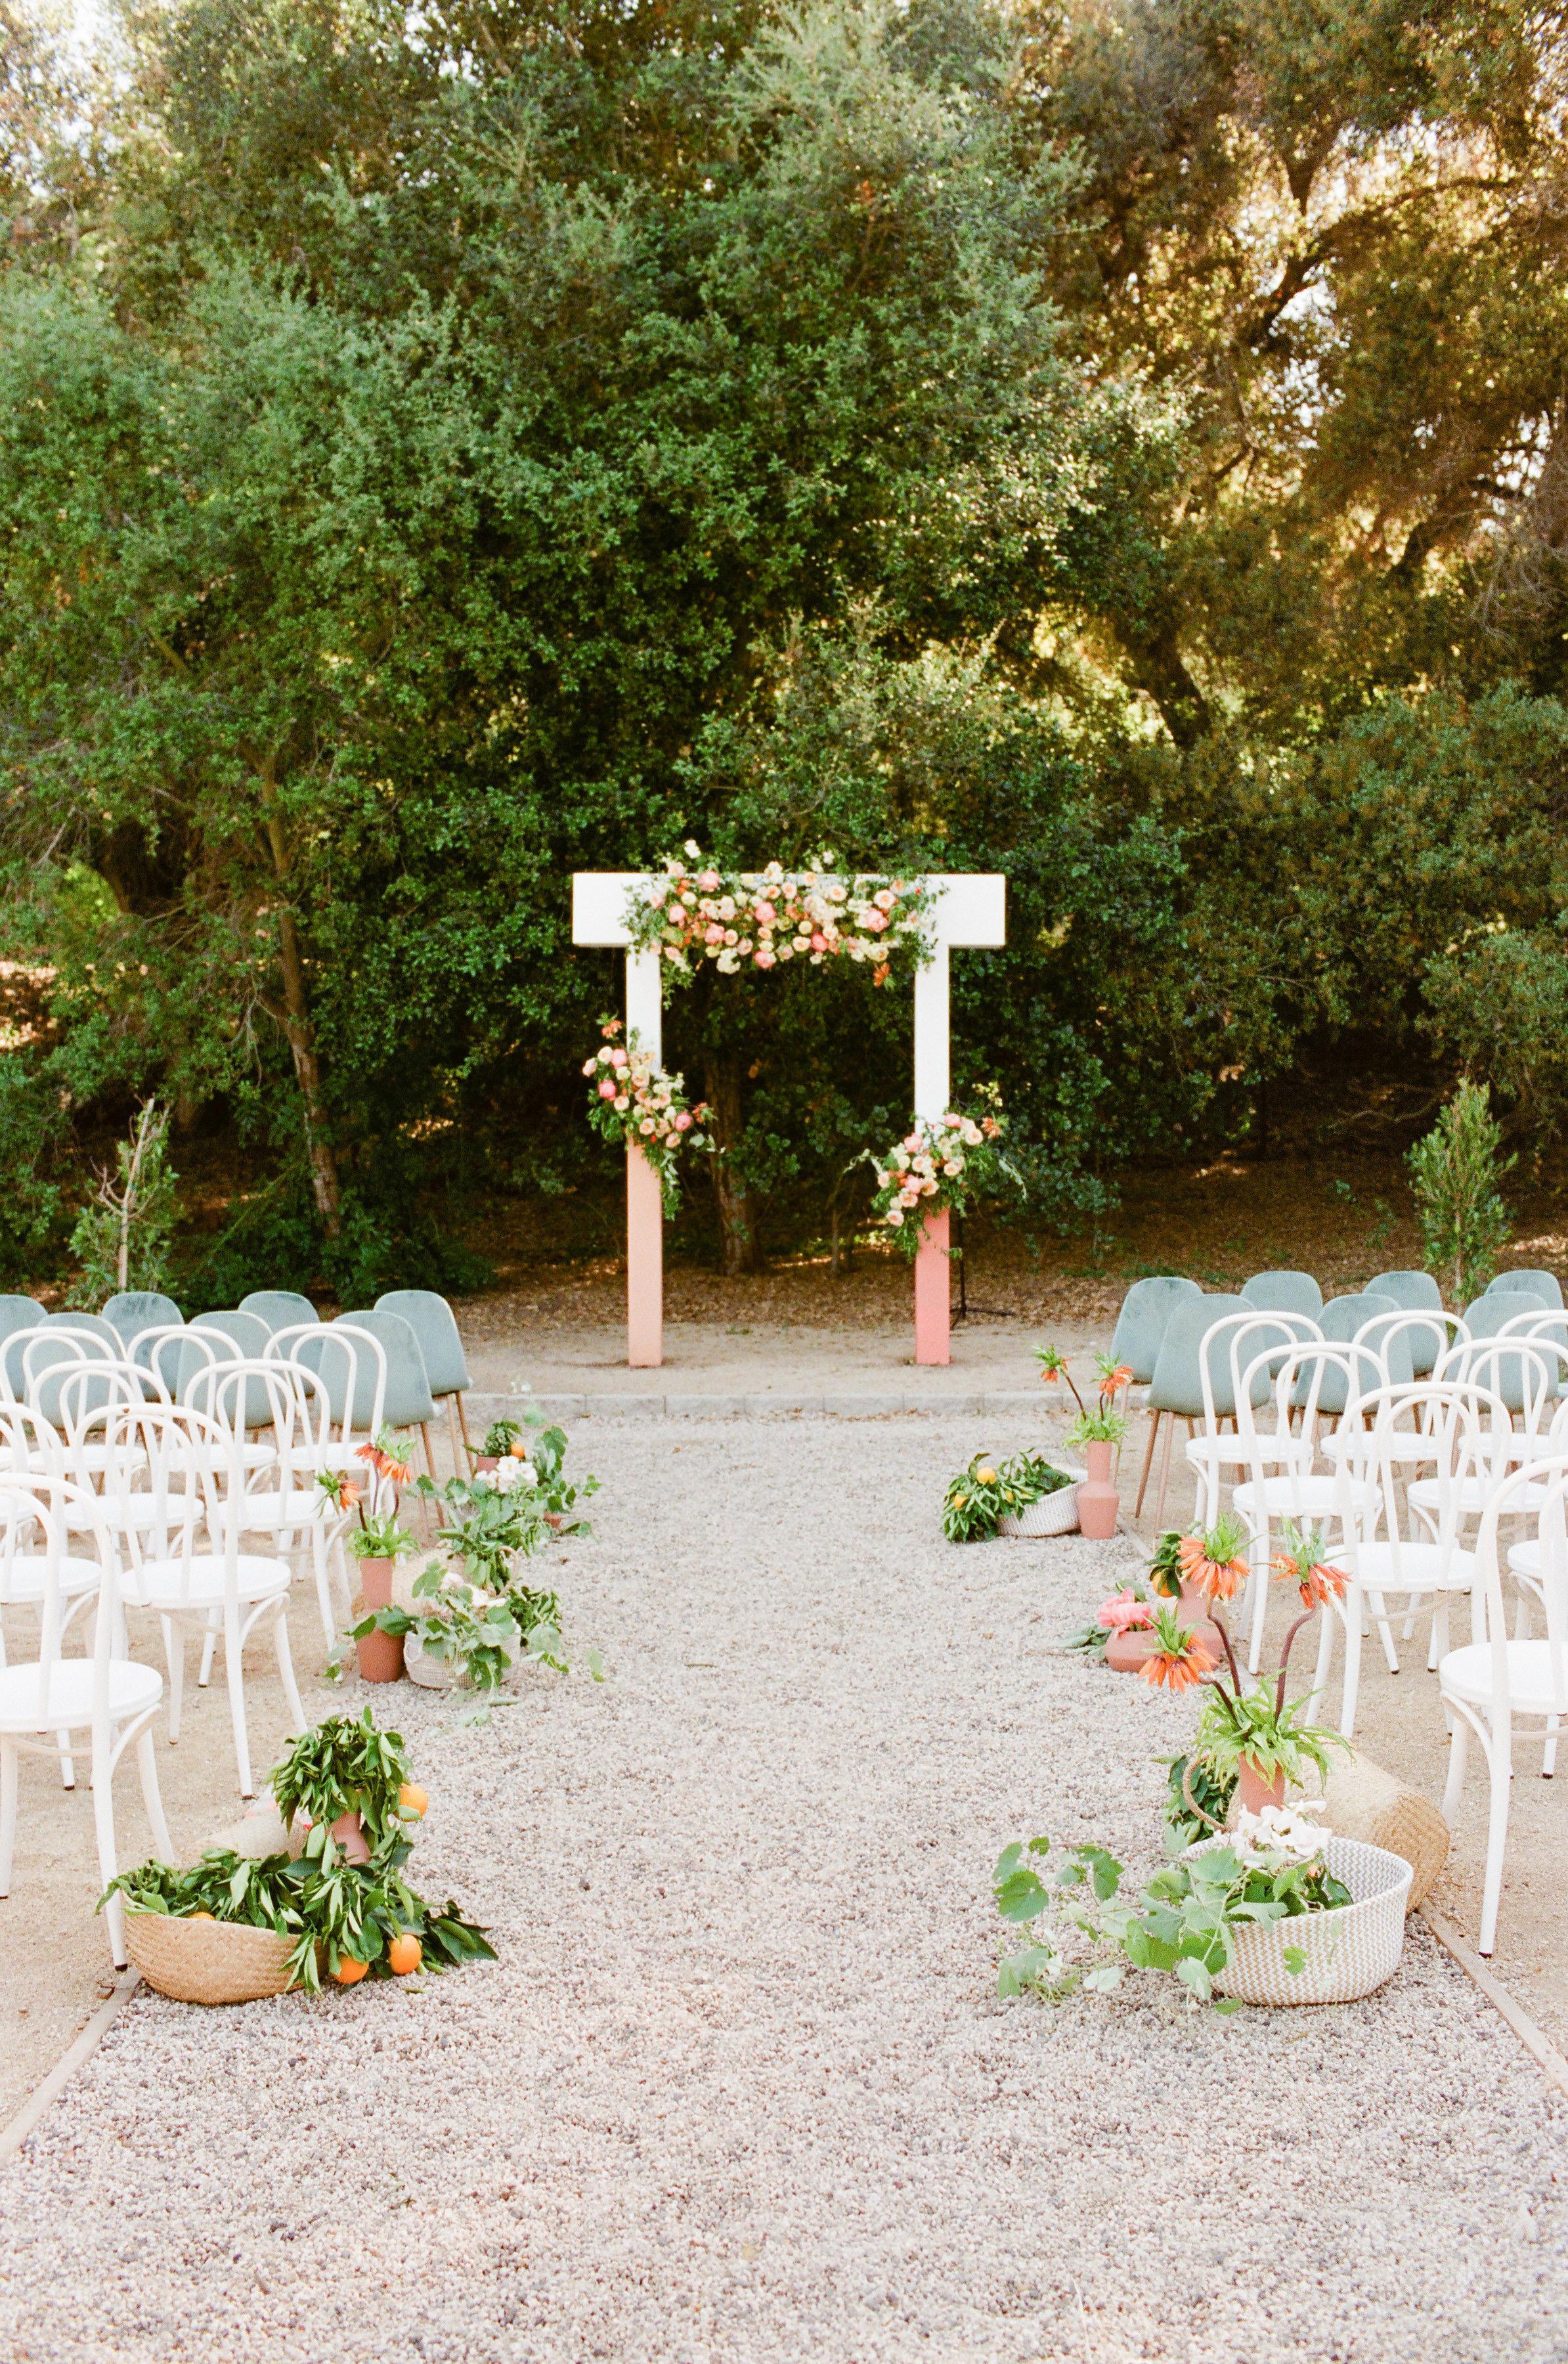 Tenley molzahn taylor leopold wedding ceremony flowered arch